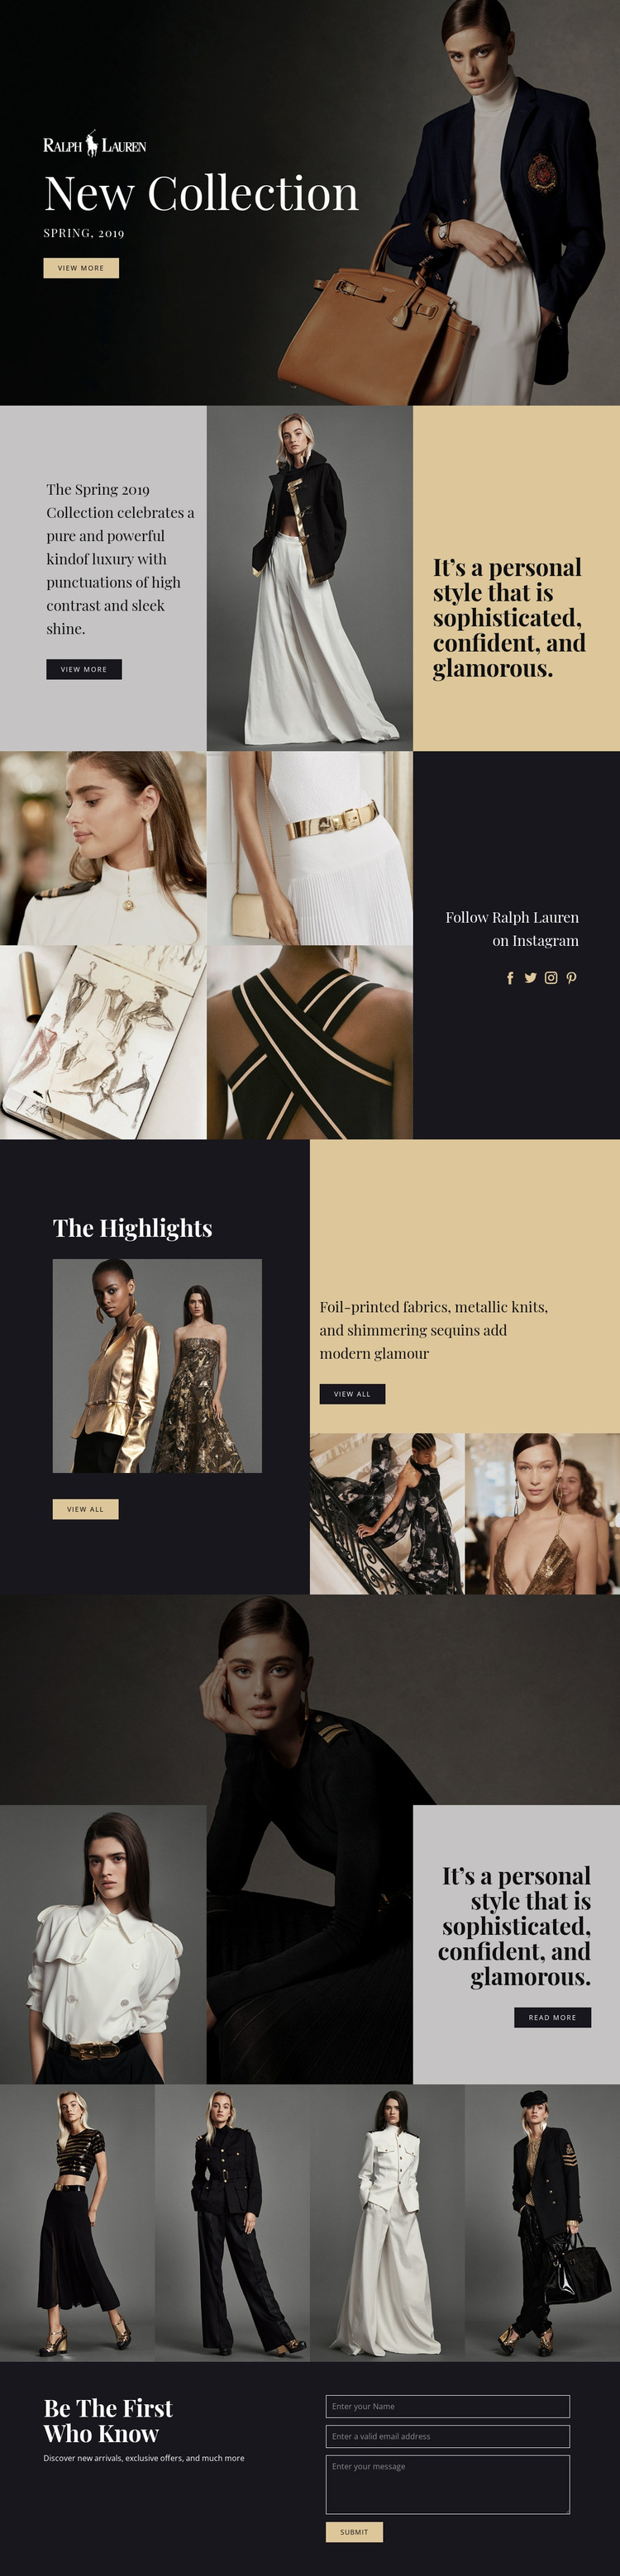 Ralph Lauren fashion Web Design